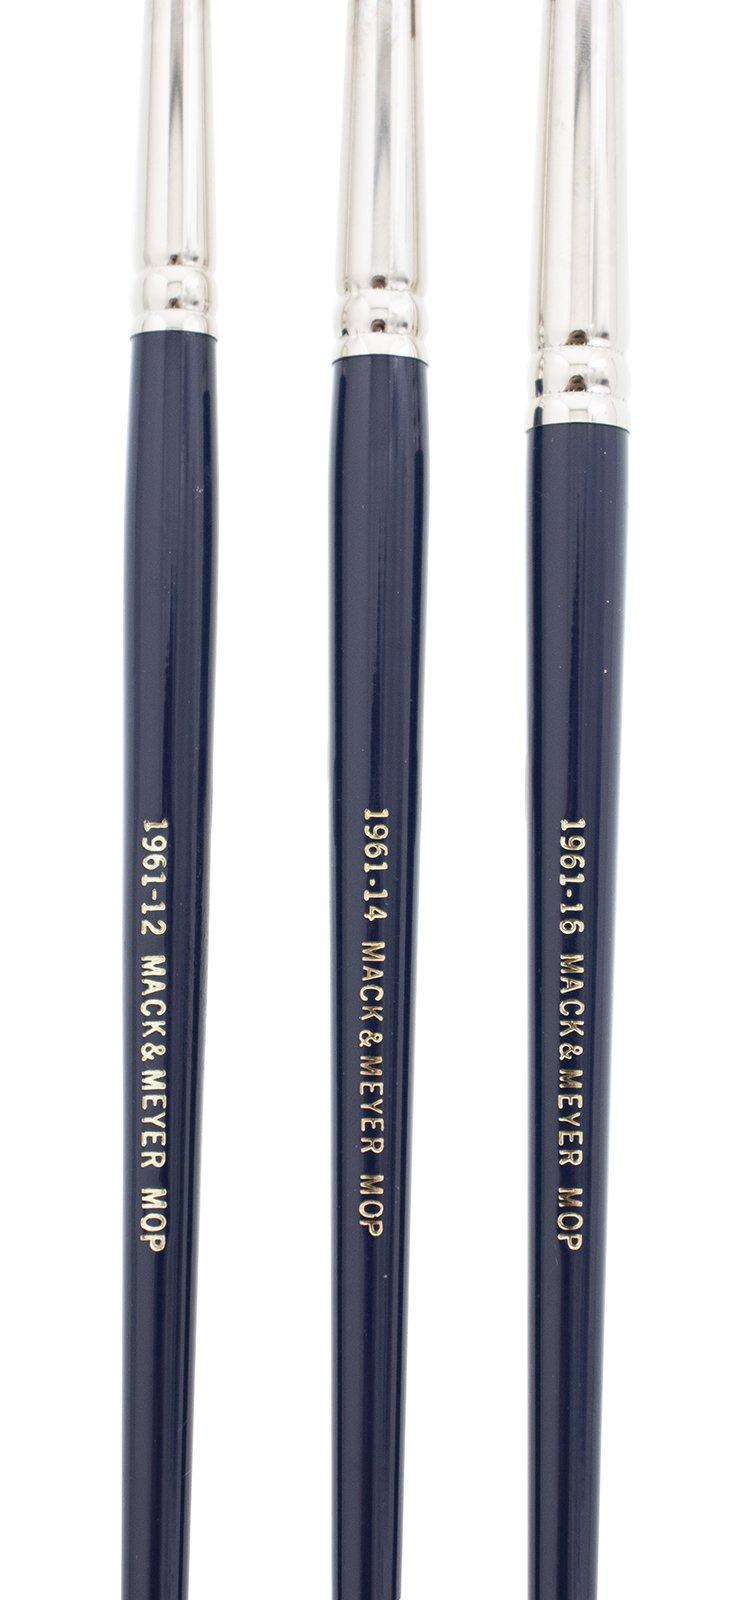 Andrew Mack Brush AM1961-12-16 Series 1961 Mack & Meyer Mop Pinstriping Brushes Sizes 12-16 by Andrew Mack Brush (Image #3)